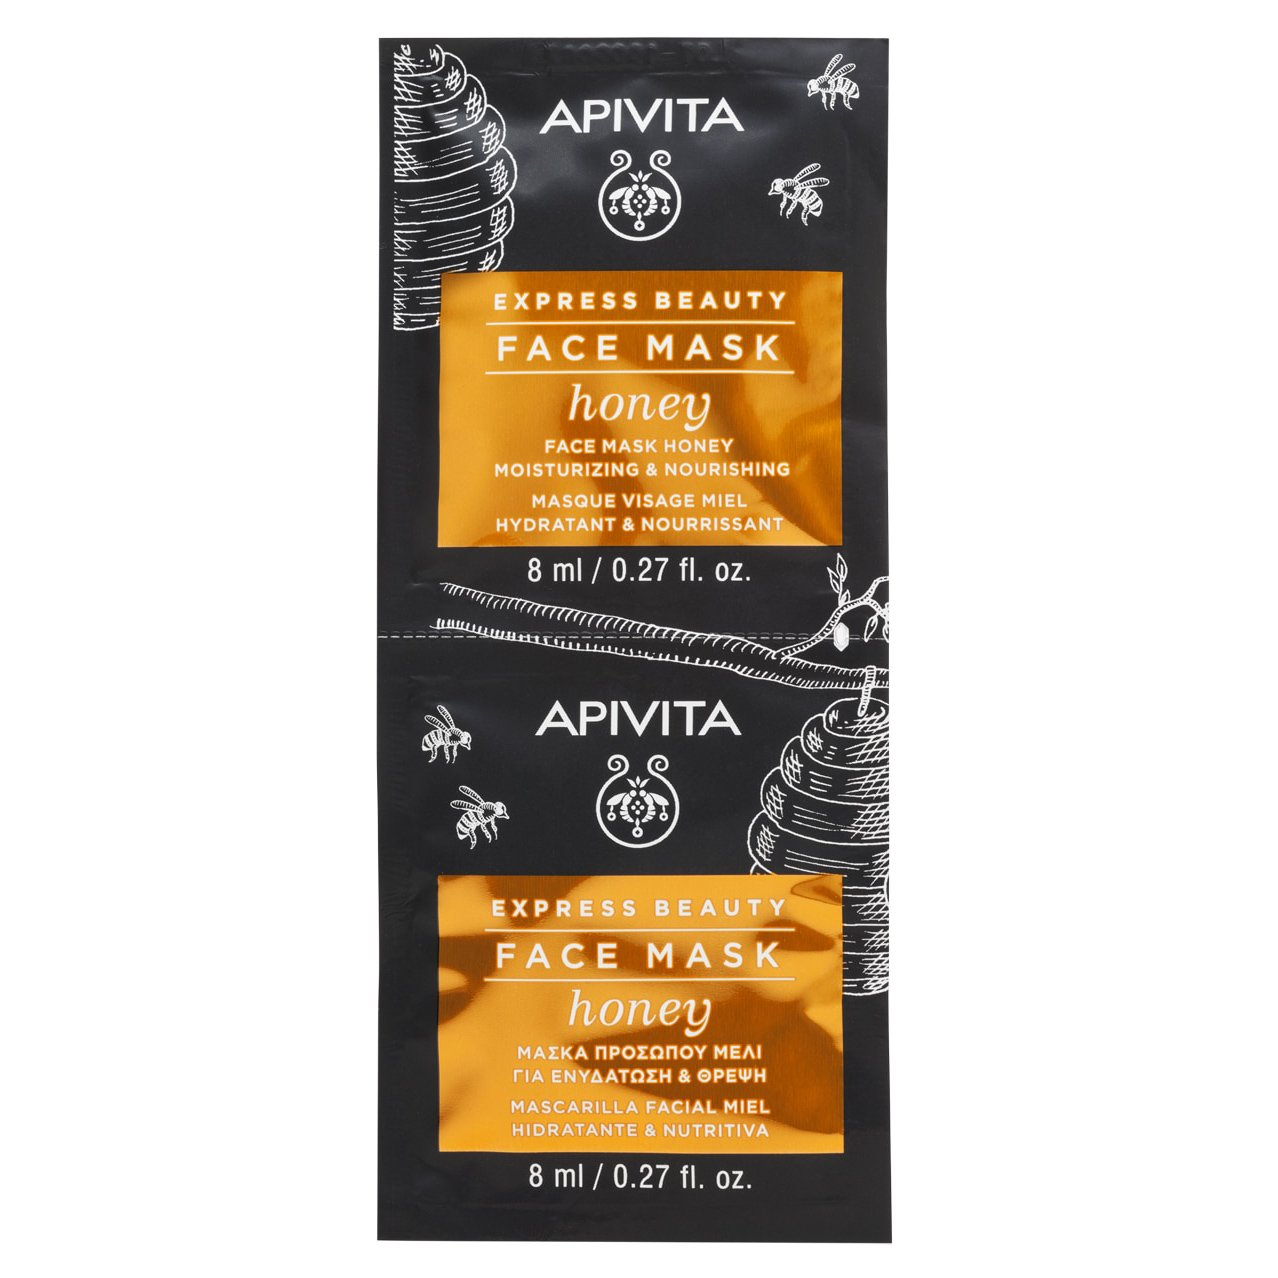 Apivita Express Beauty Μάσκα Ενυδάτωσης Και Τροφής Με Μέλι 2x8ml